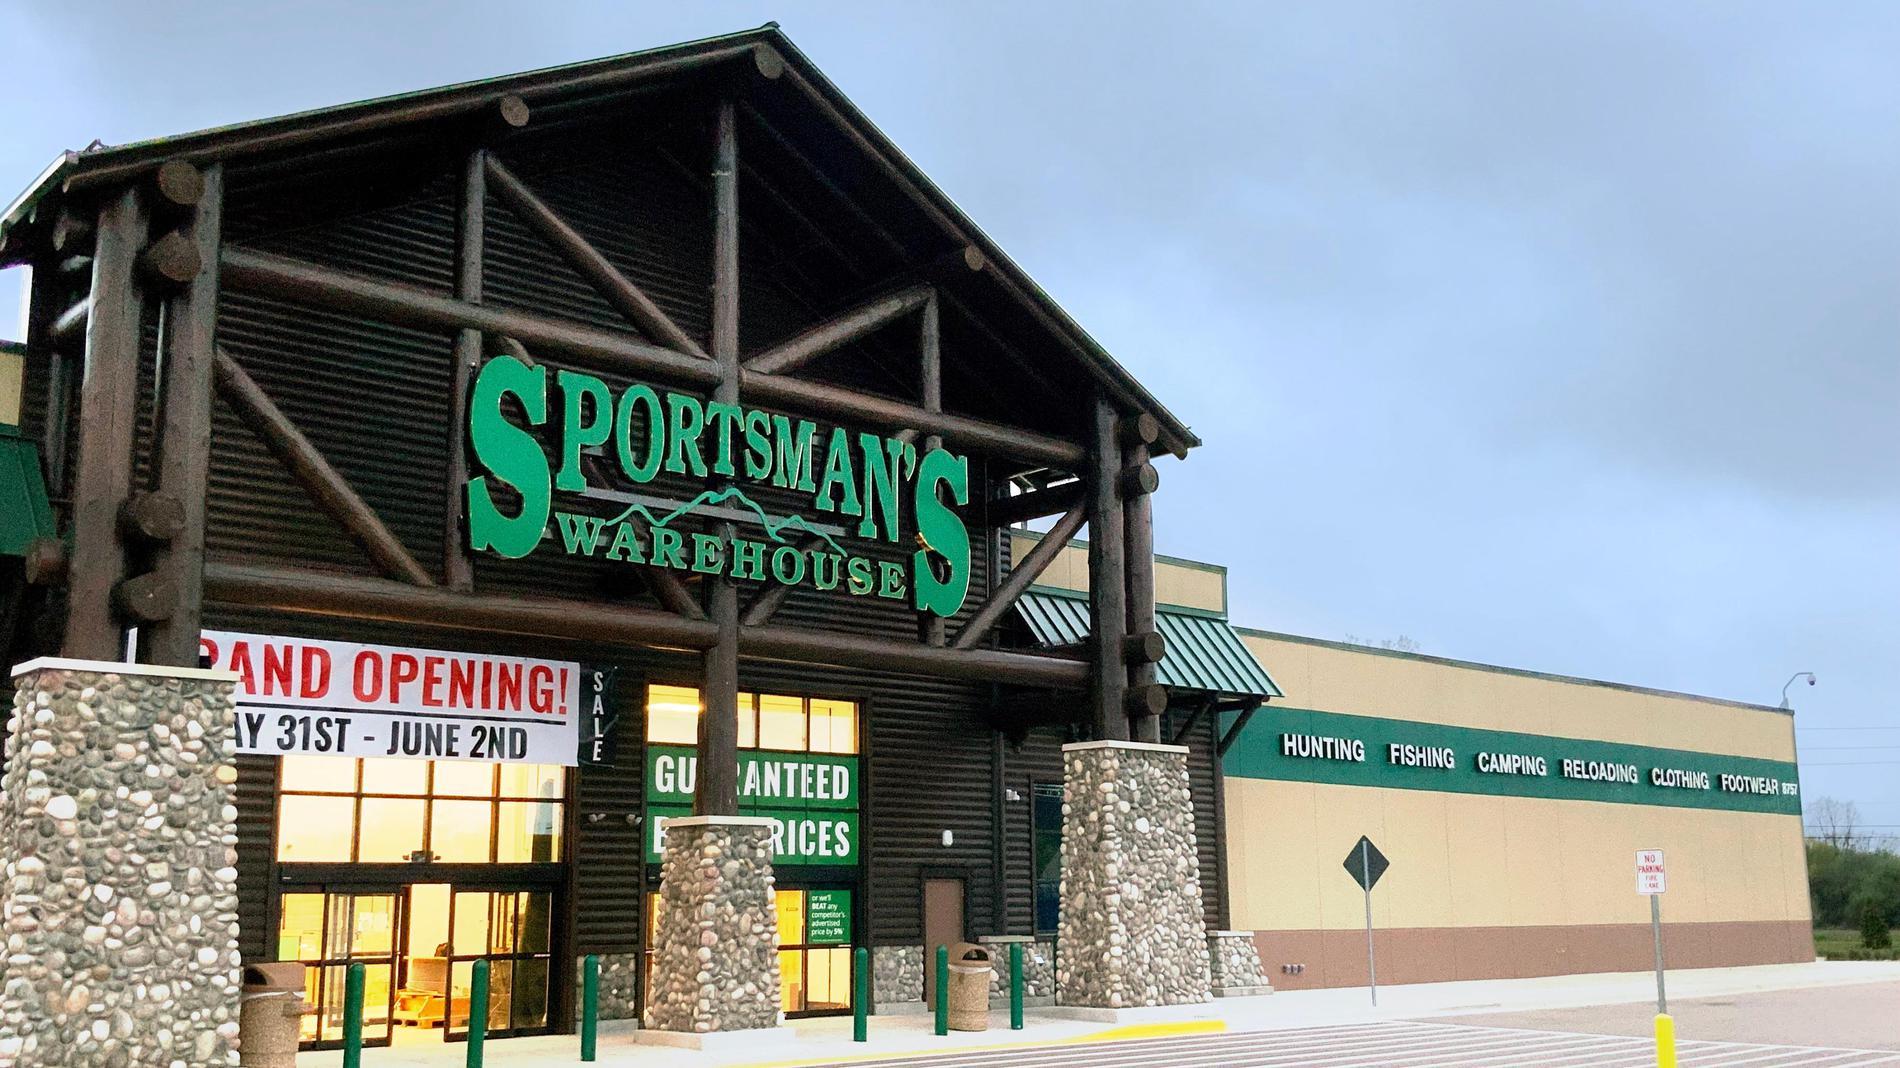 warehouse lansing sportsman mi outdoor sportsmans sporting stores market gear